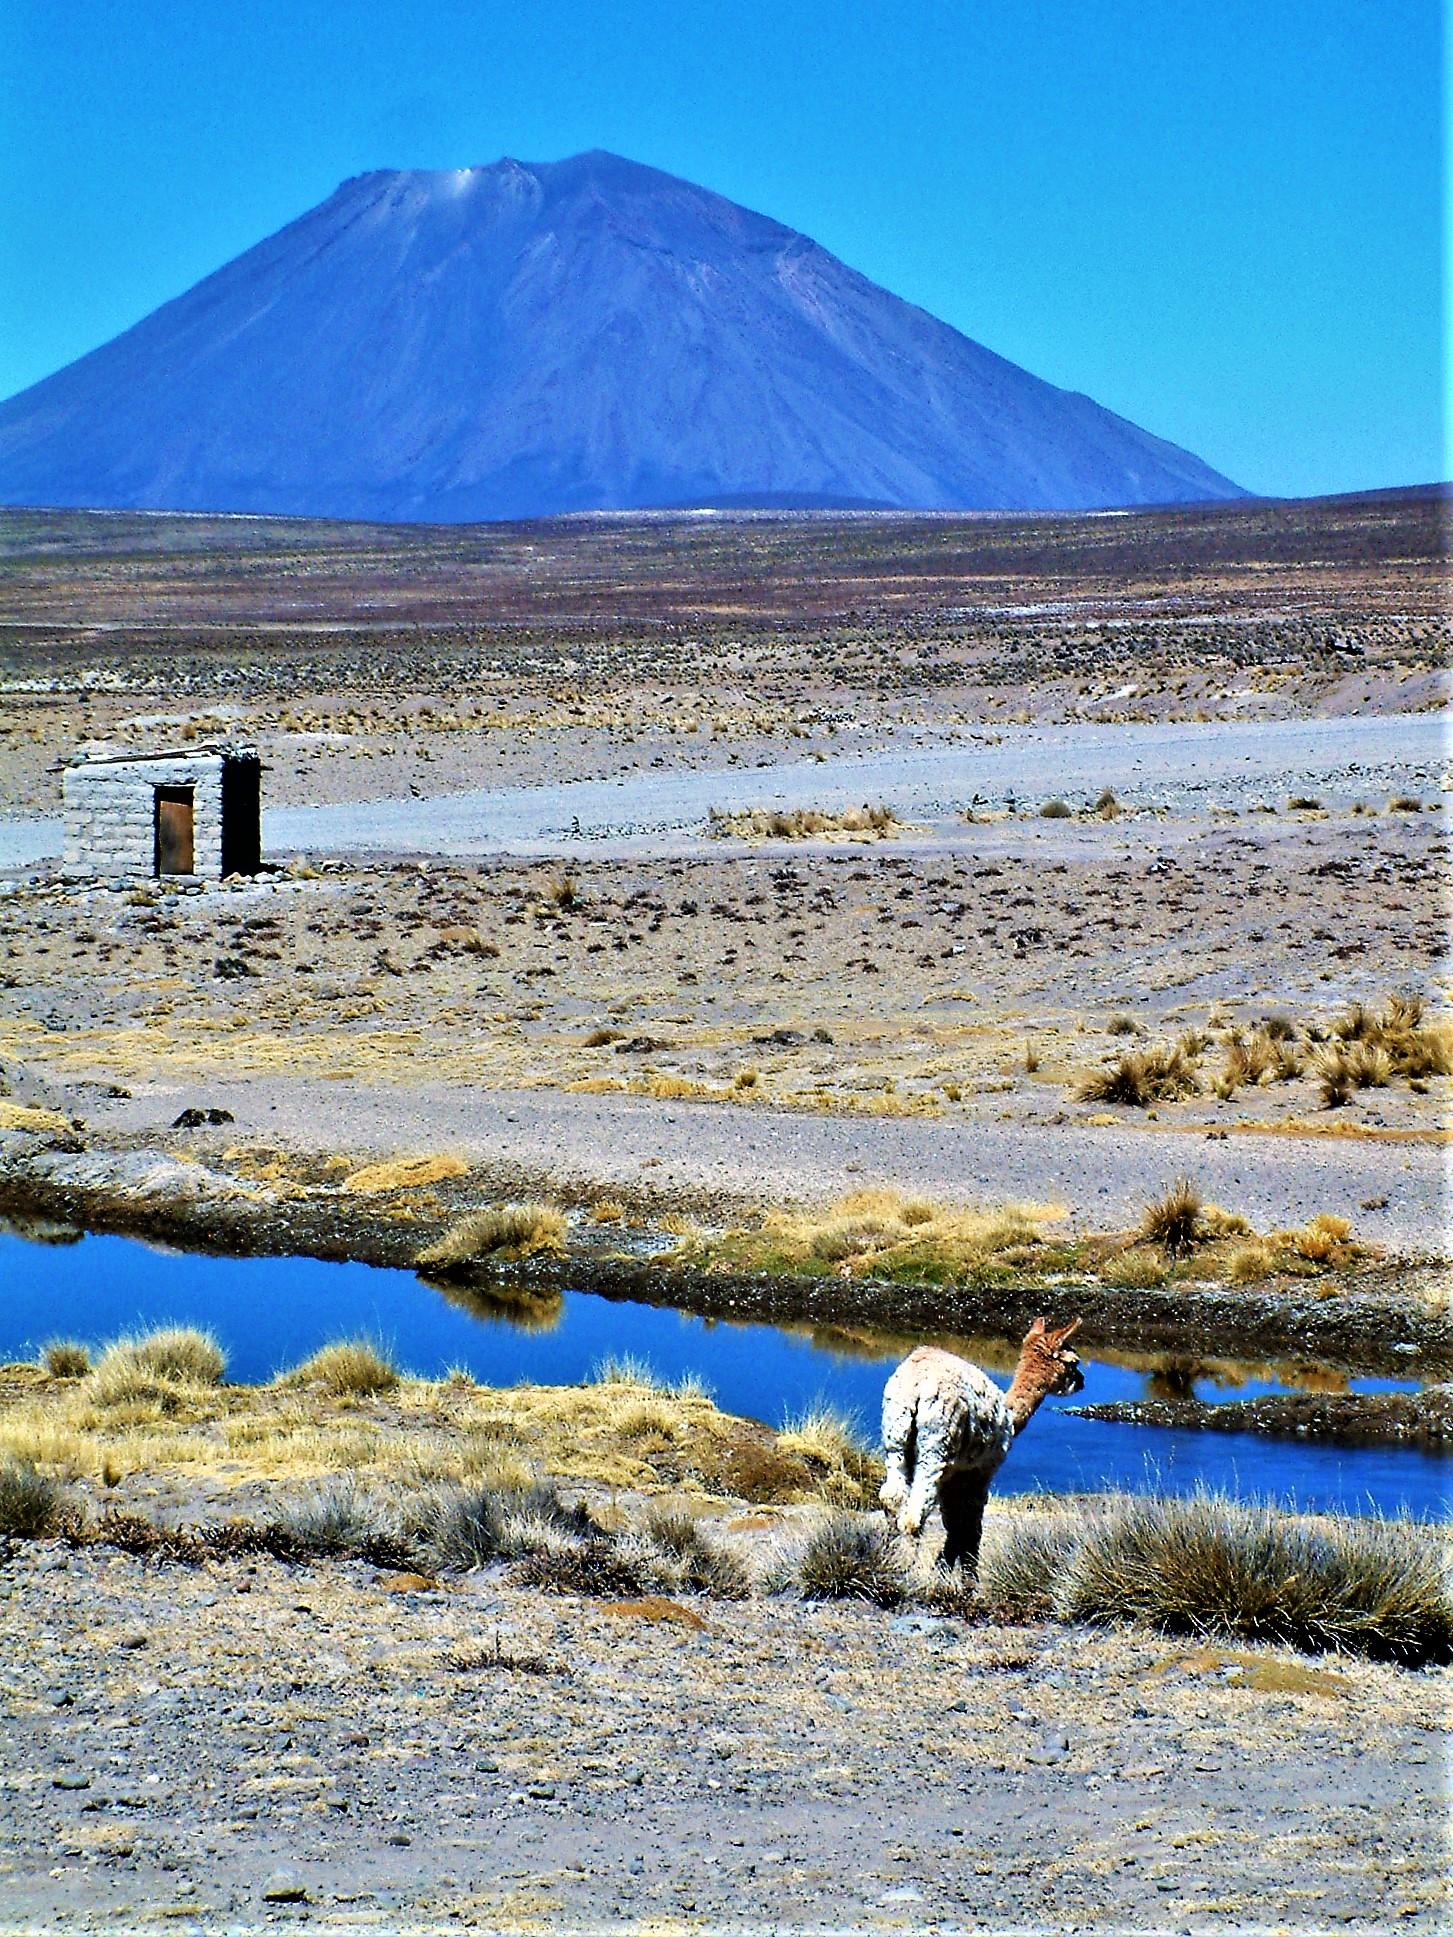 Peru  Volcanoes Spinning Yarn and strange green rocklike